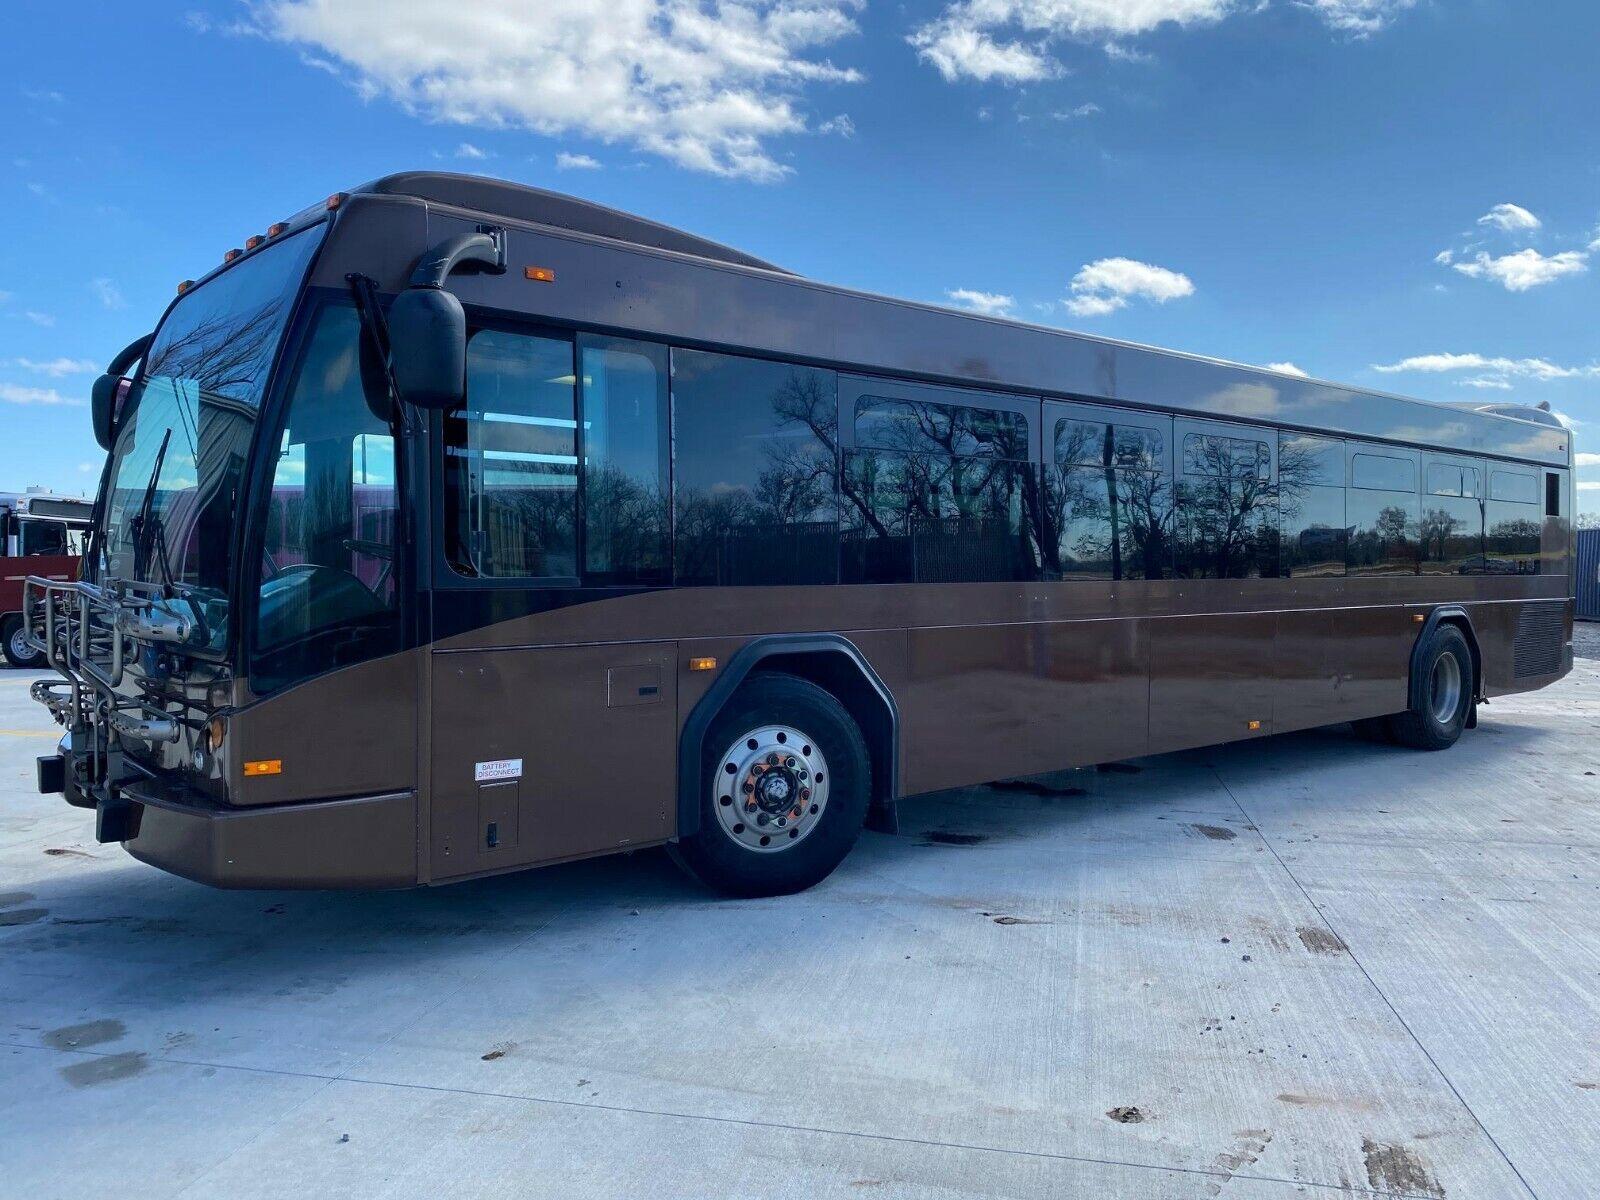 2006 Gillig BRT Low Floor Transit Bus RV Coach MCI Party Bus Skoolie